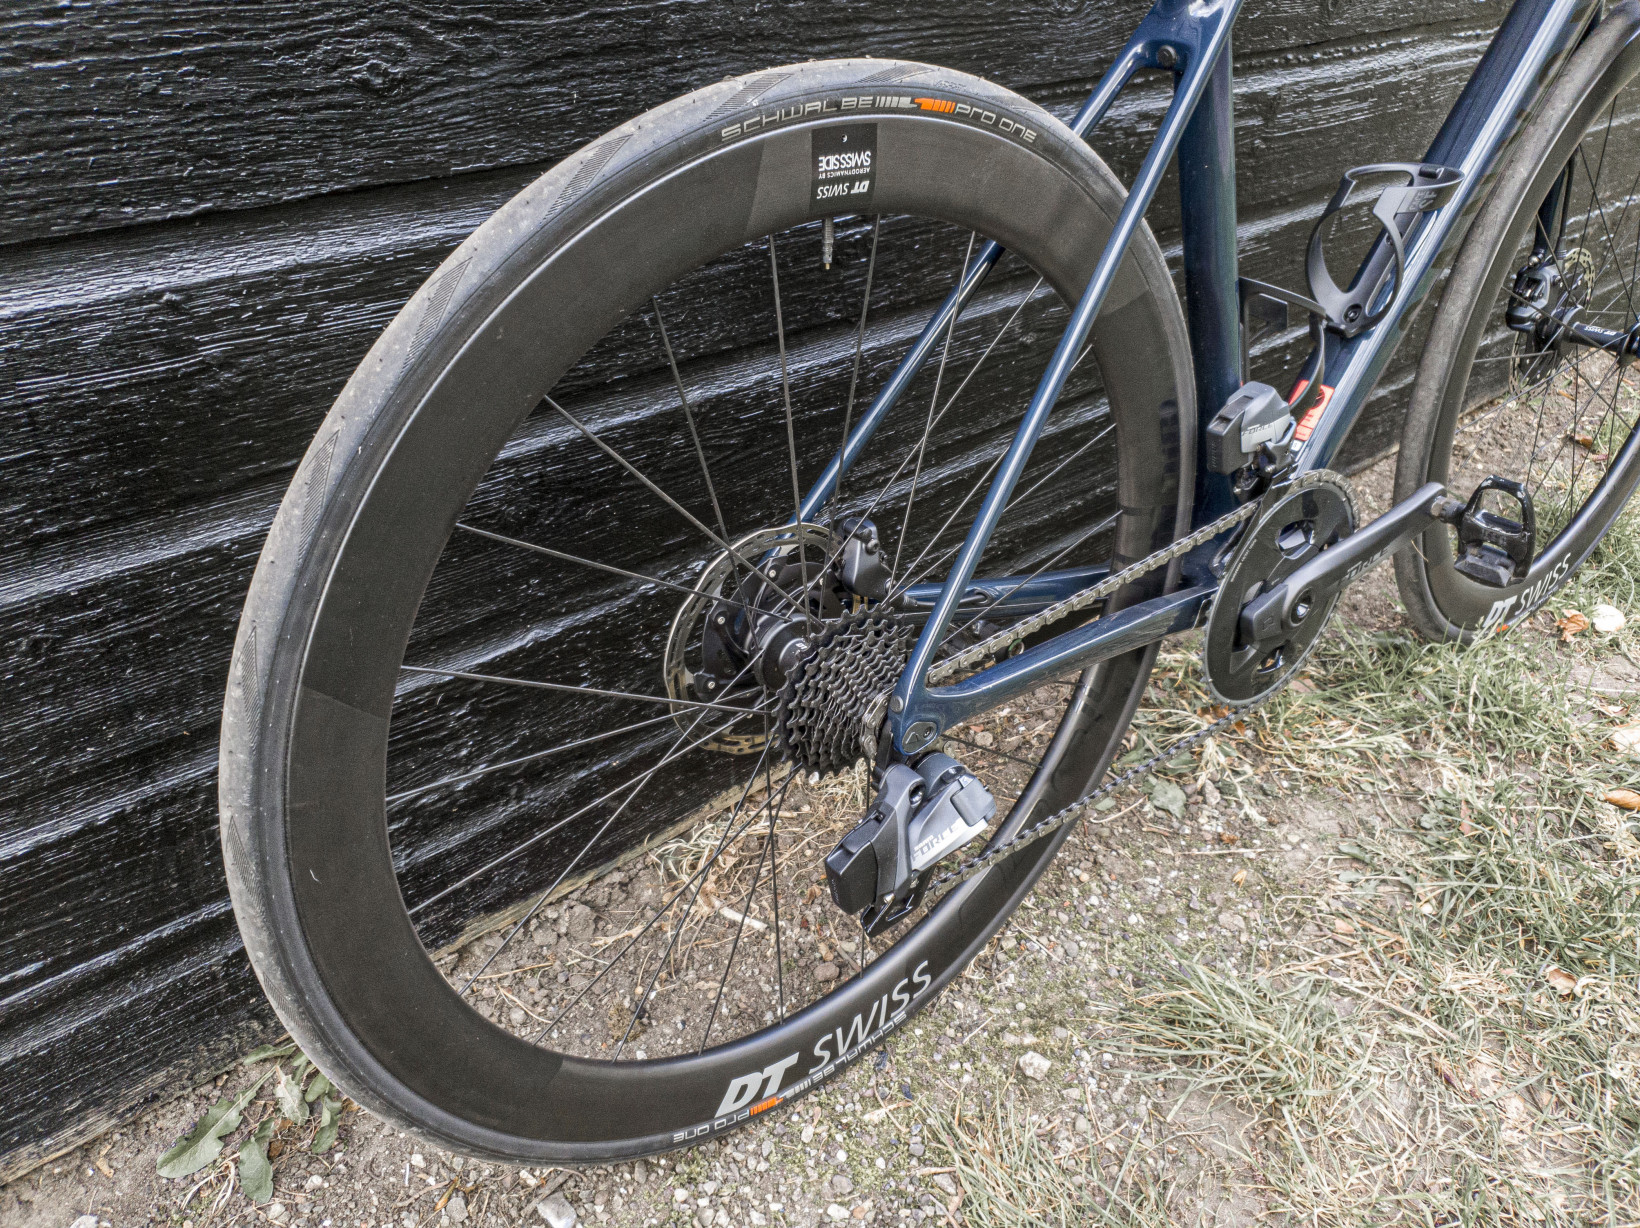 wheelset, bike, dt swiss, arc, dicut